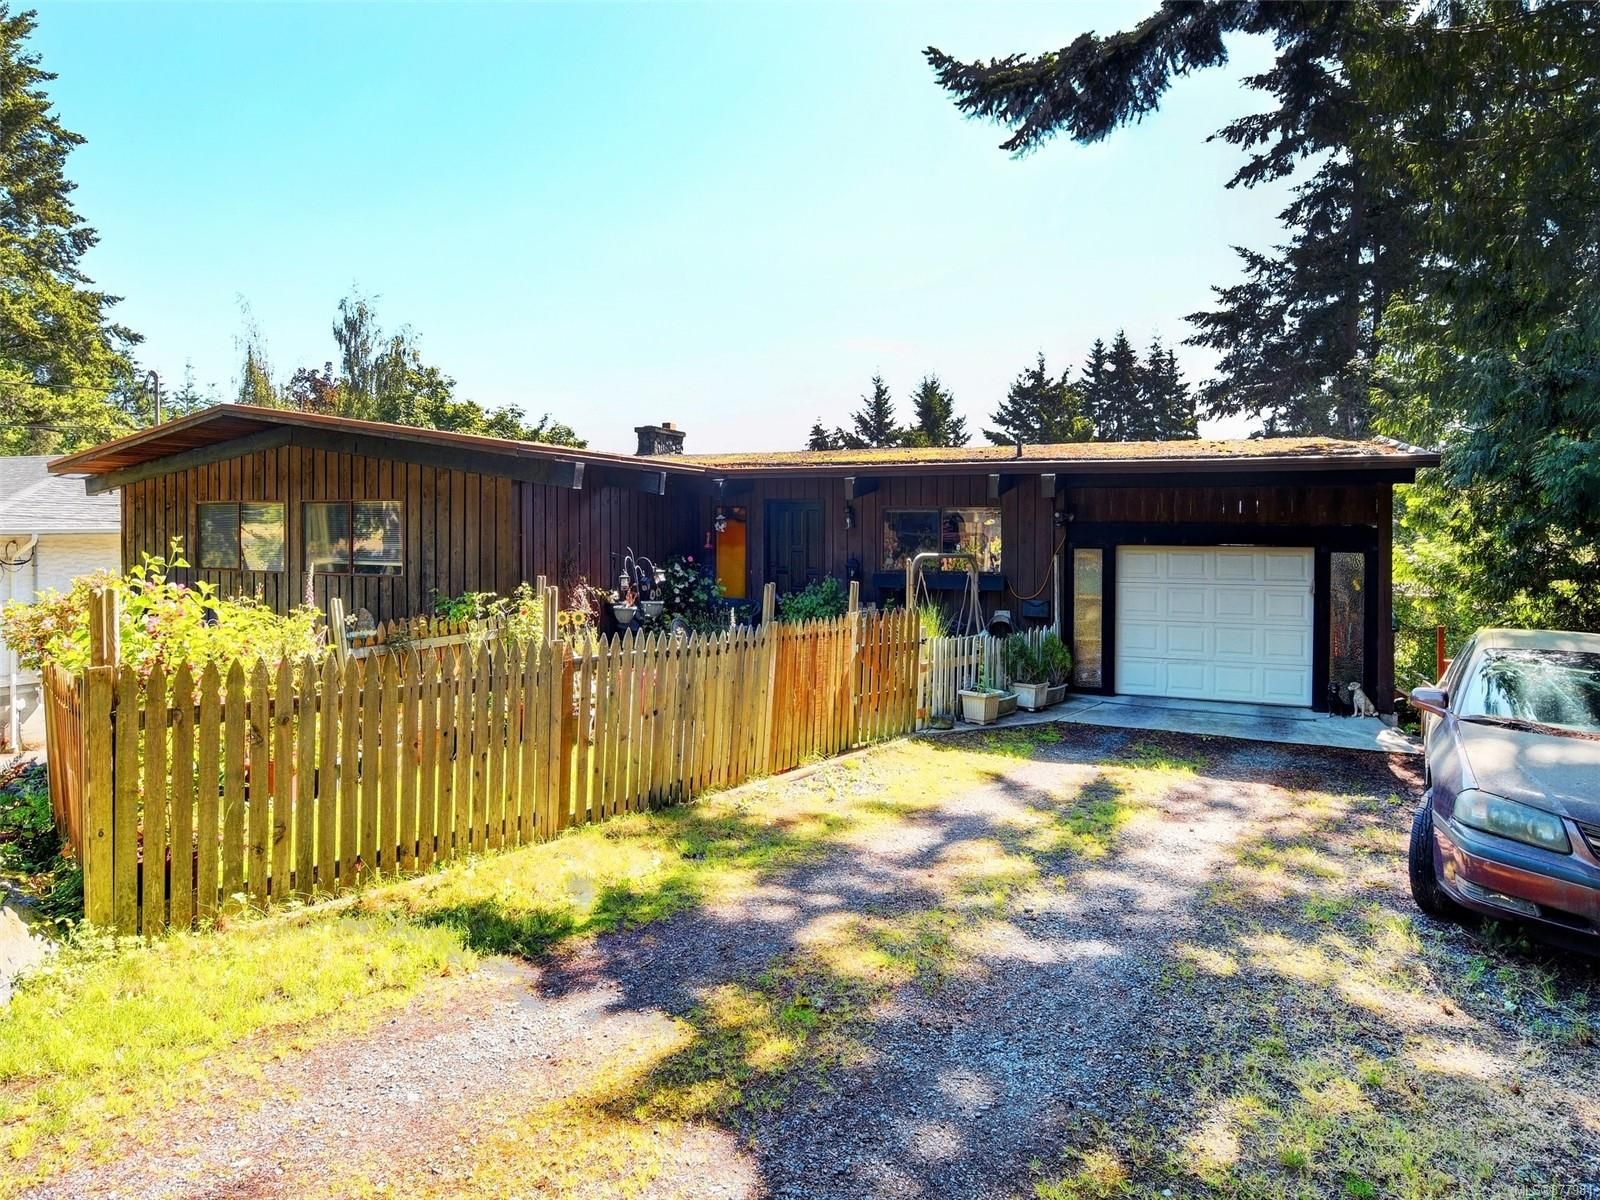 Main Photo: 4889 Lochside Dr in : SE Cordova Bay House for sale (Saanich East)  : MLS®# 877981